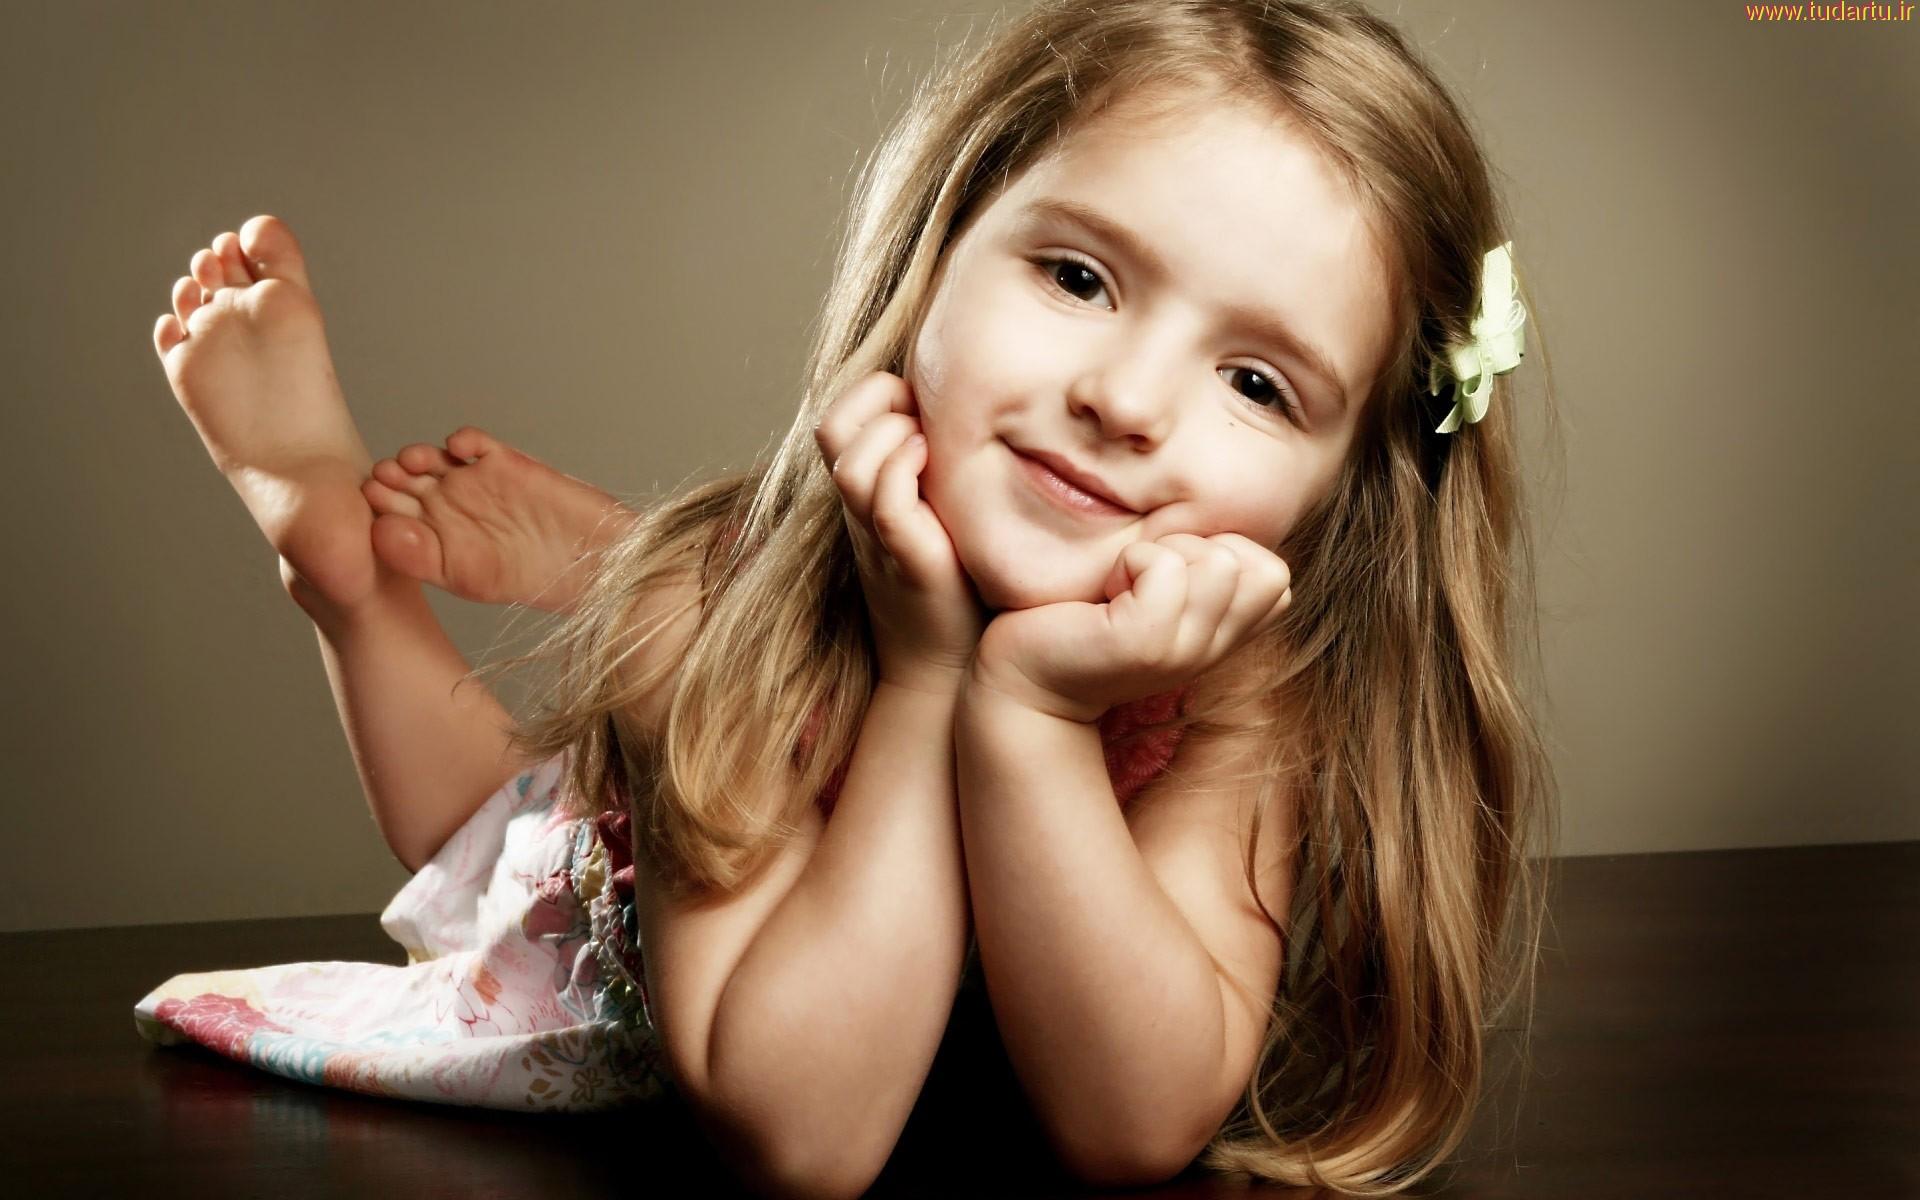 والپیپر 2 دختر کوچولوی ناز | pretty cut girls wallpaper